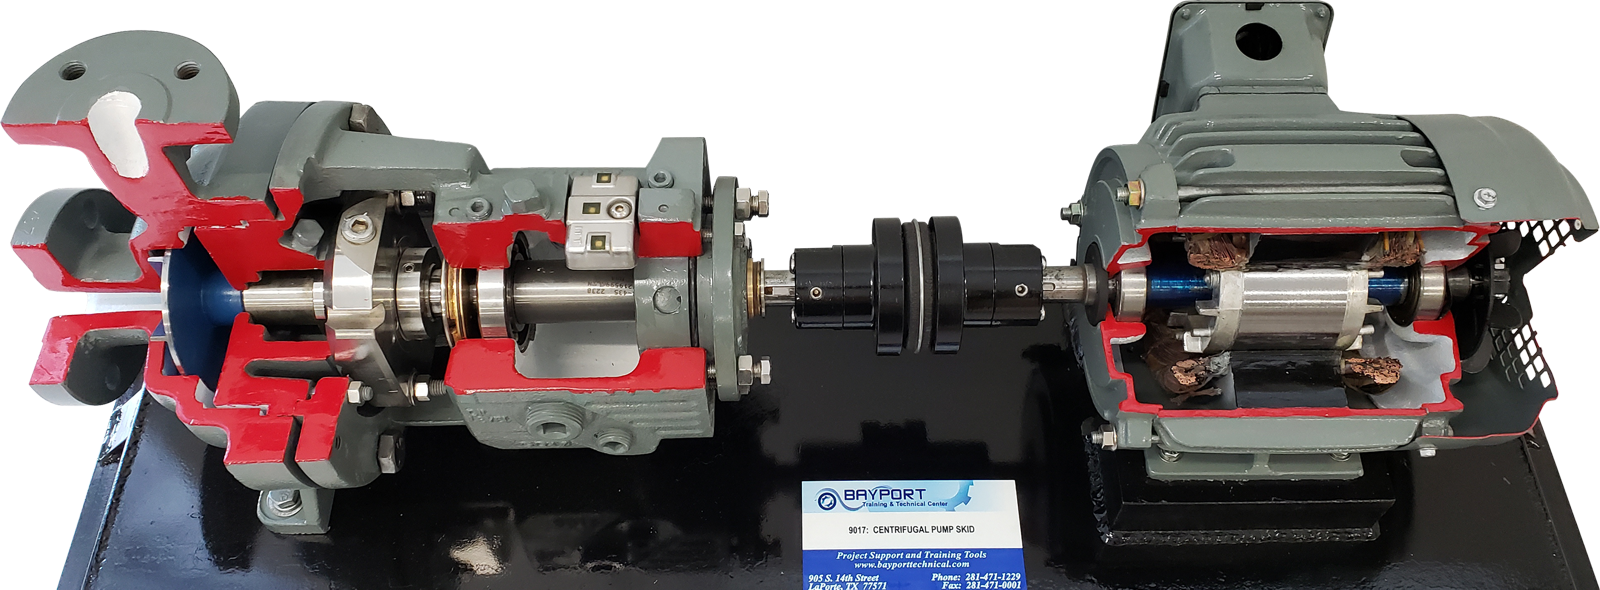 Bayport Technical | Centrifugal Pump Skid